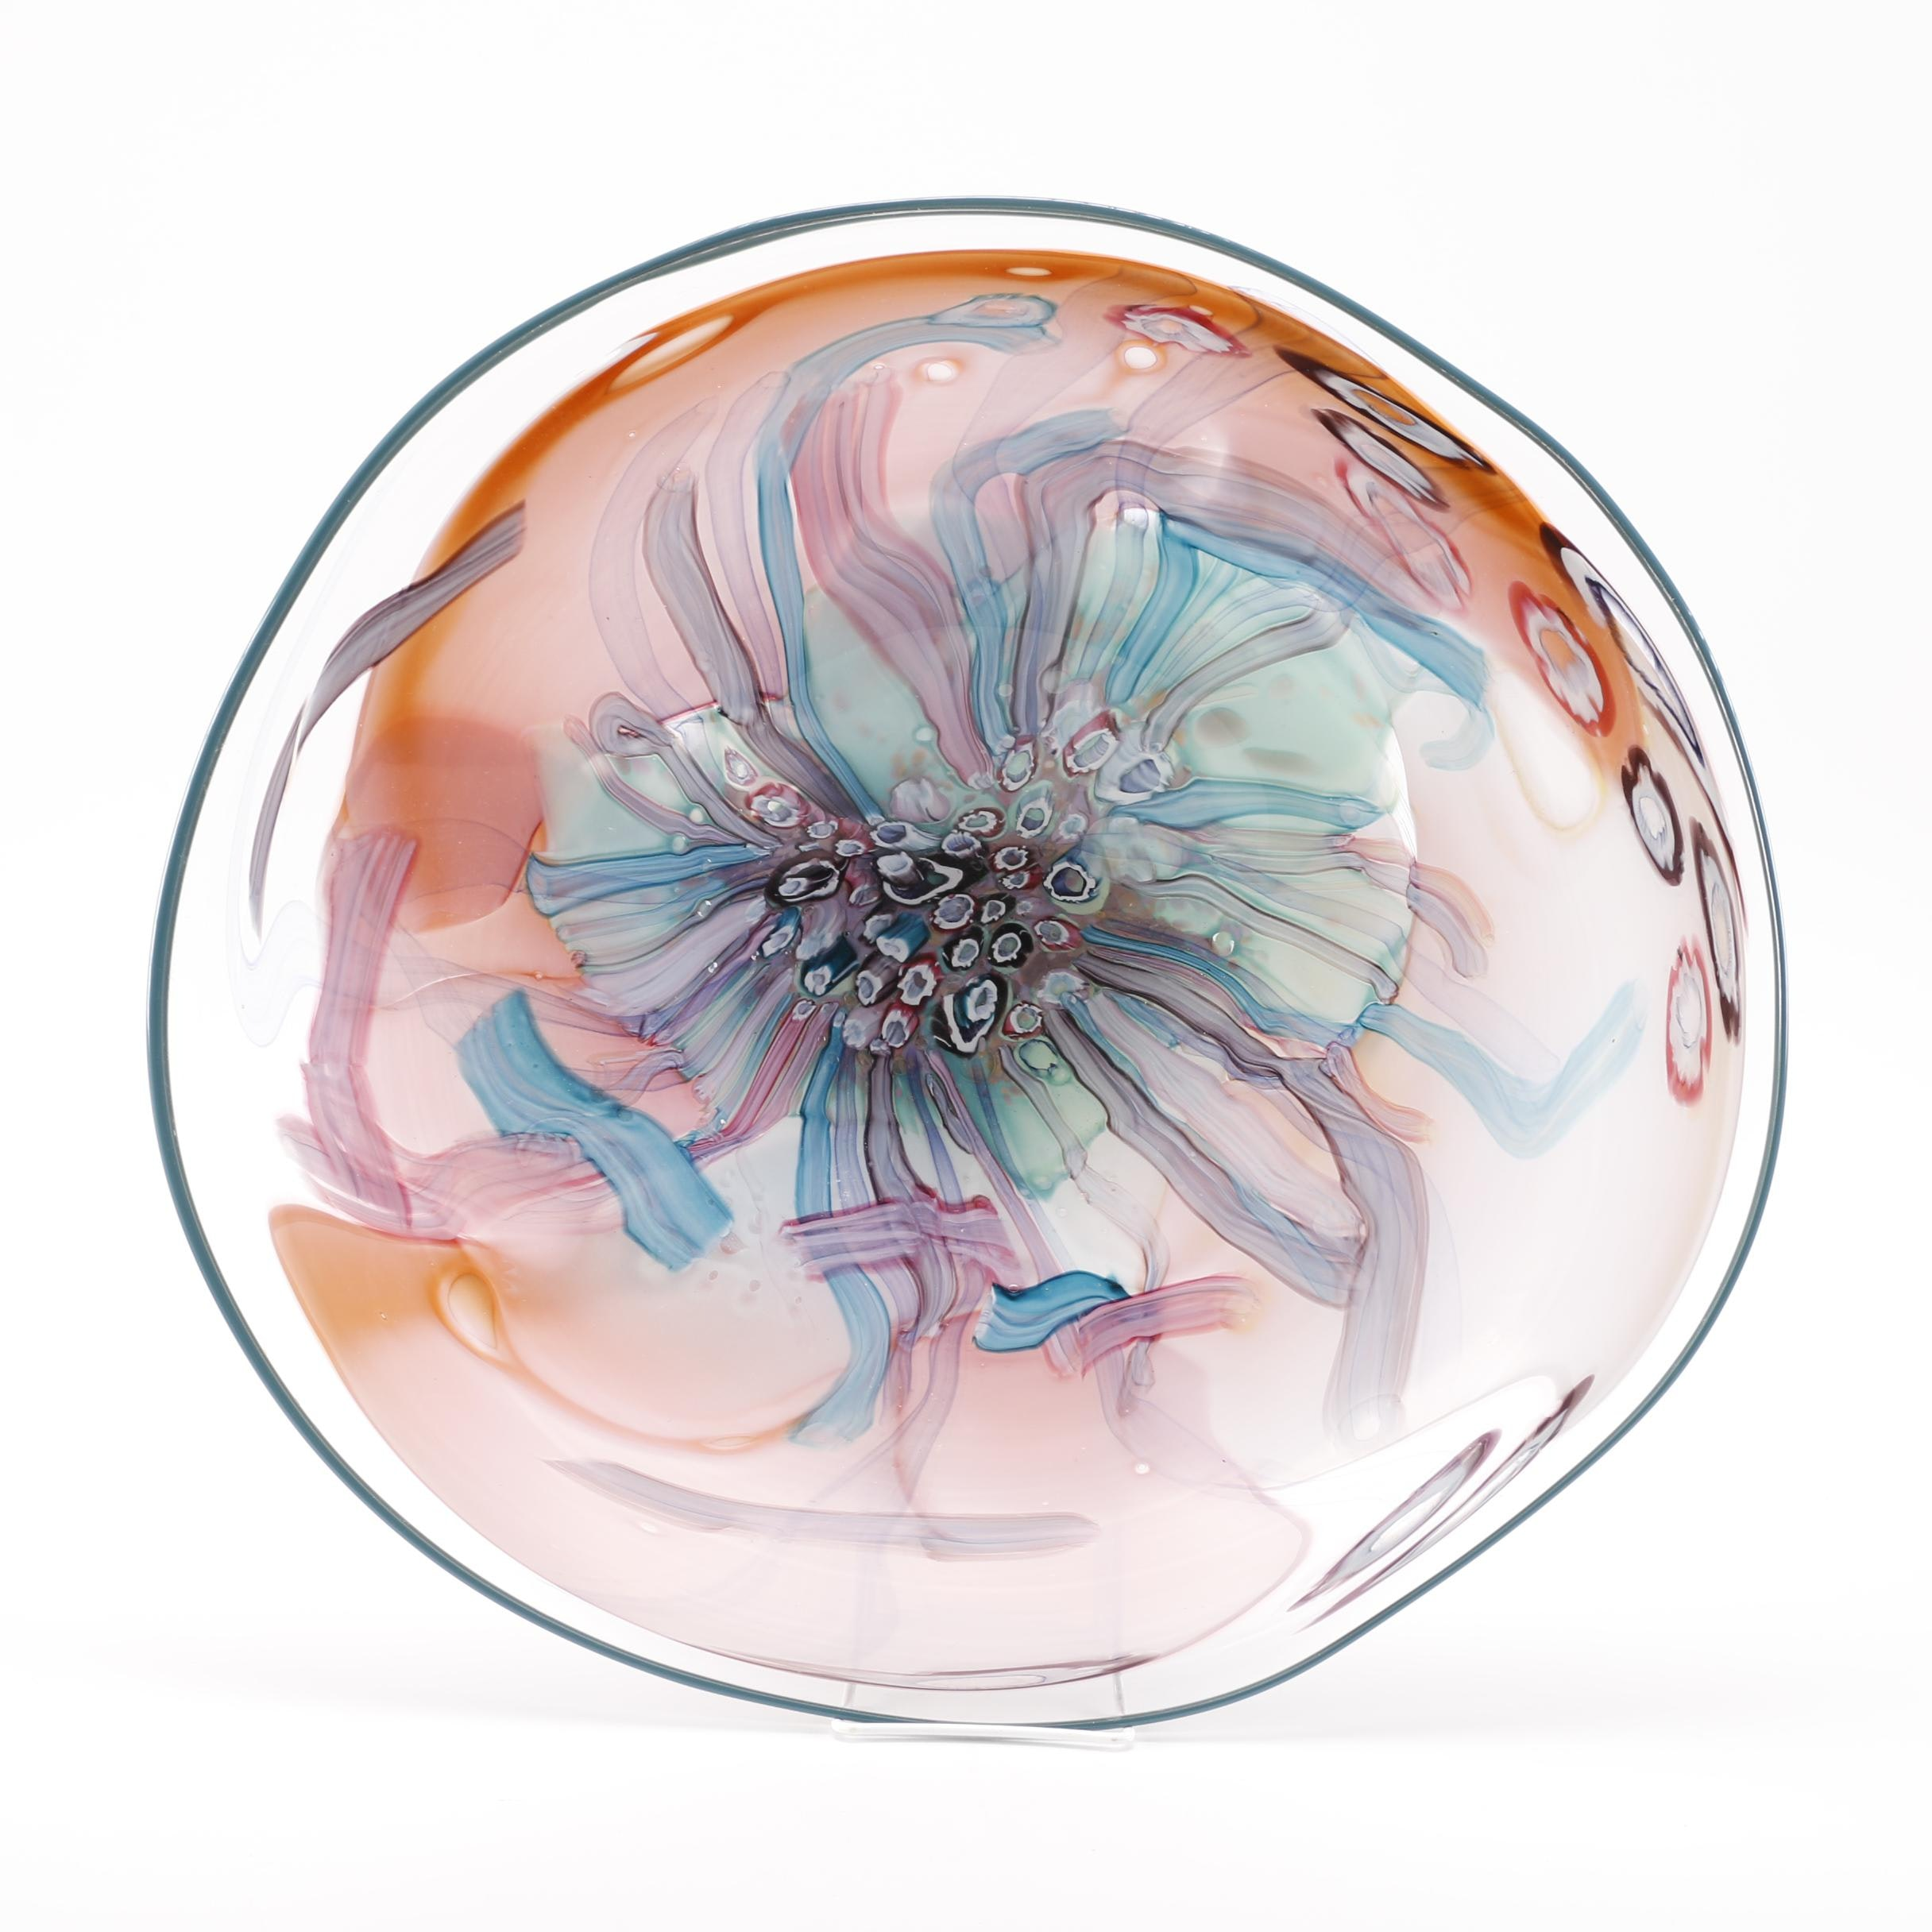 Colorful Art Glass Bowl